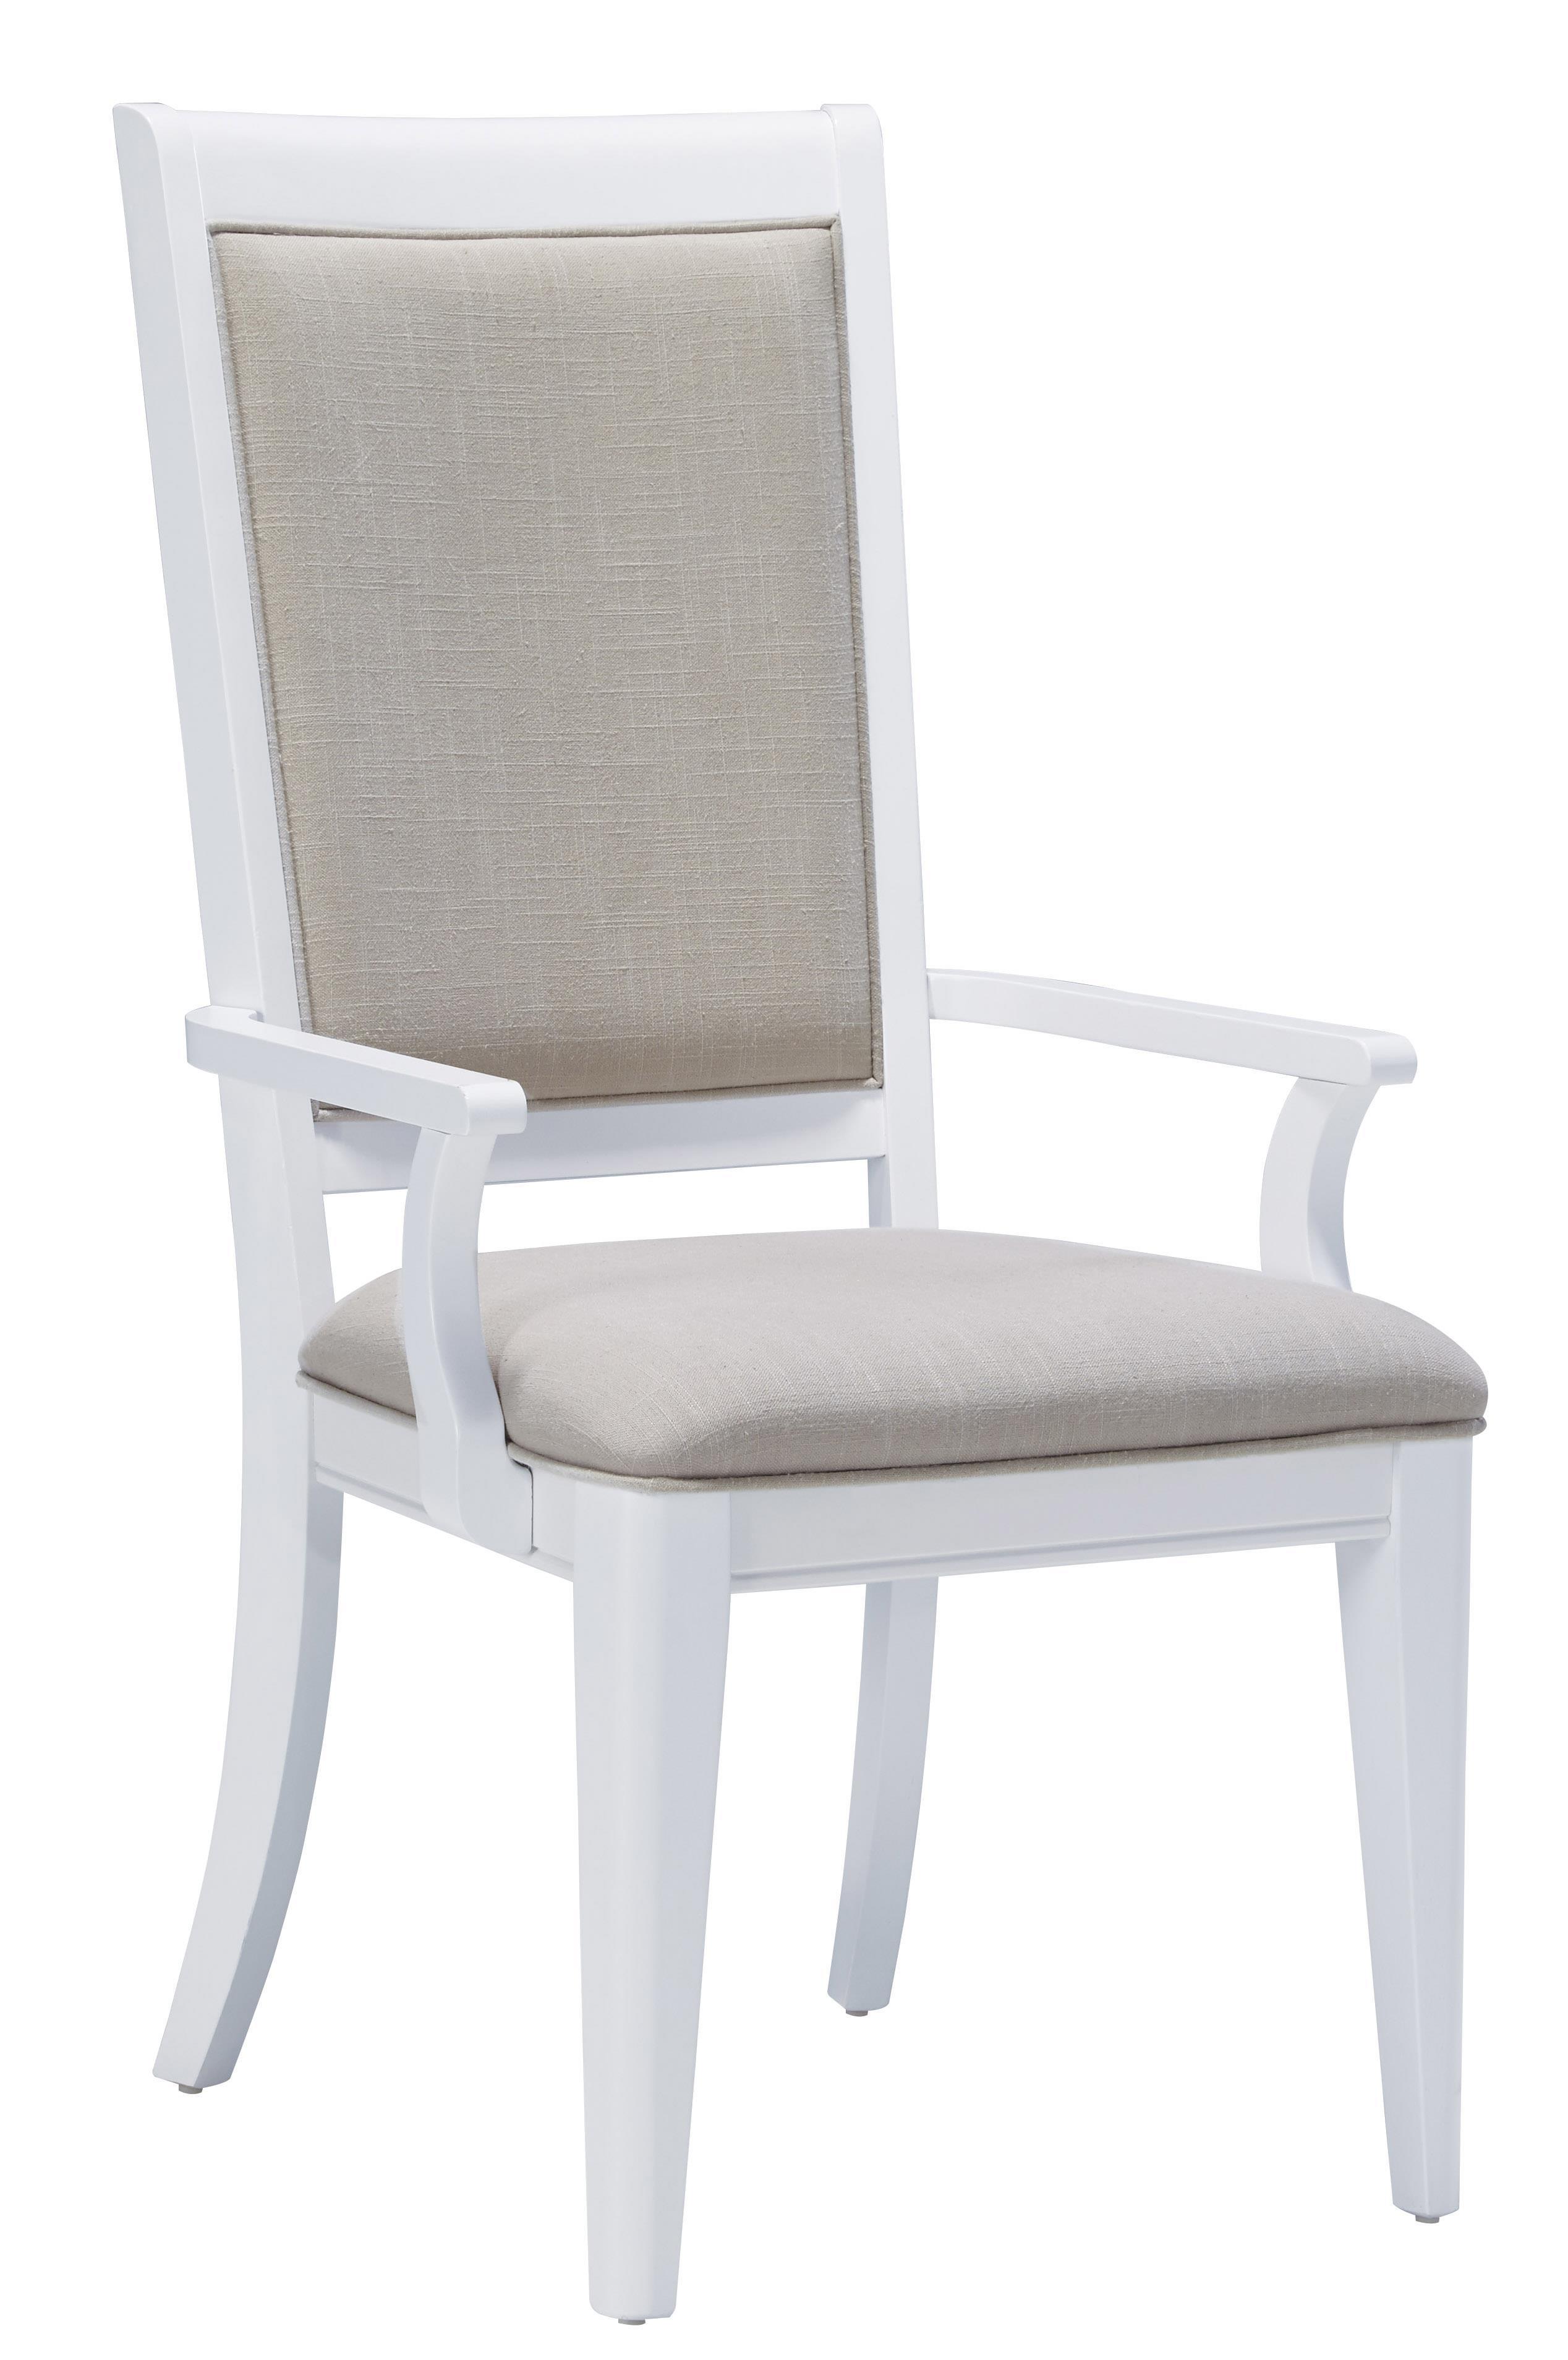 Samuel Lawrence Brighton Arm Chair - Item Number: 8673-155